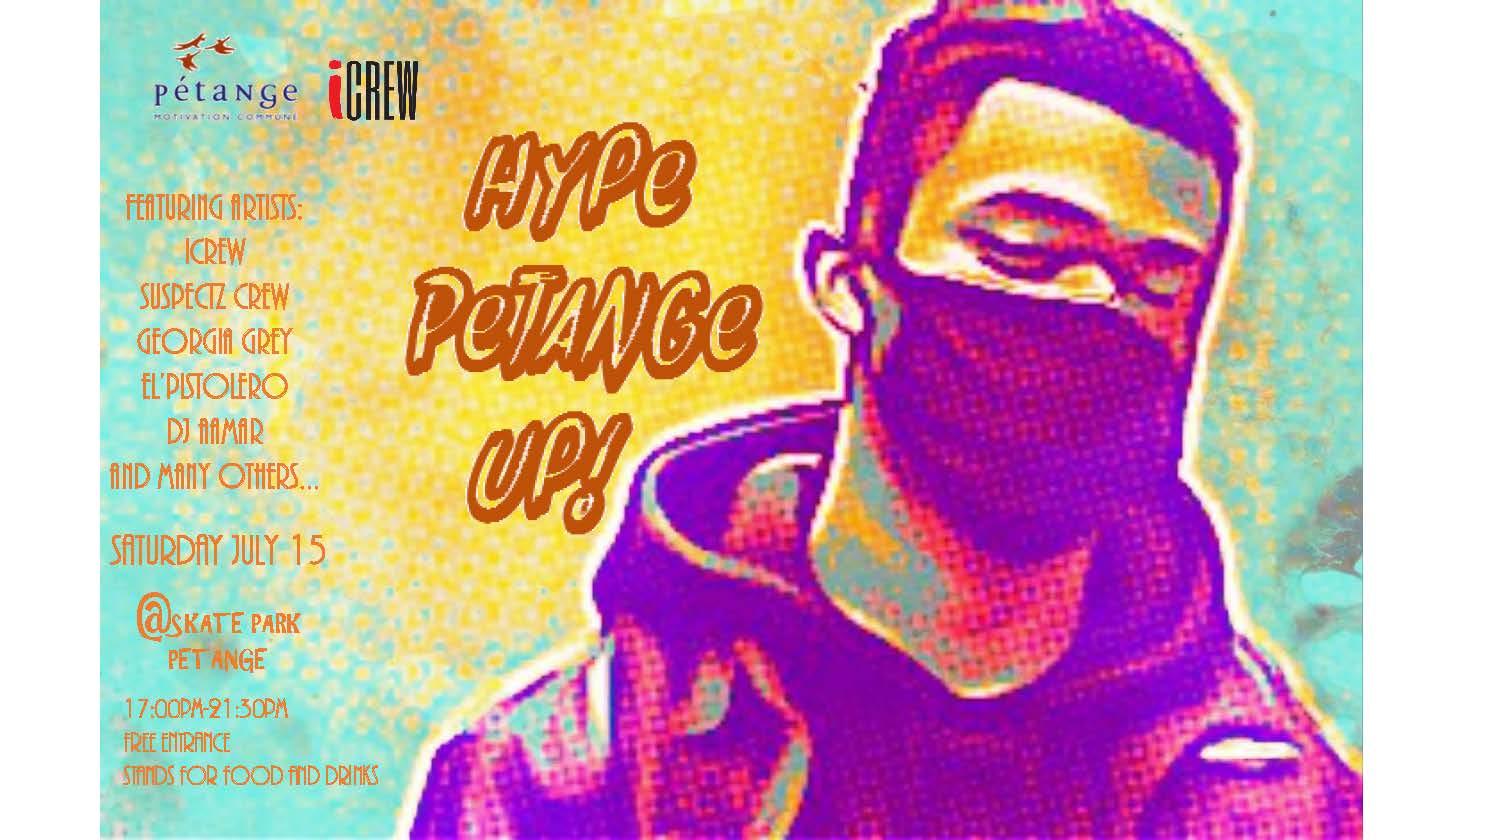 Hype Pétange Up!